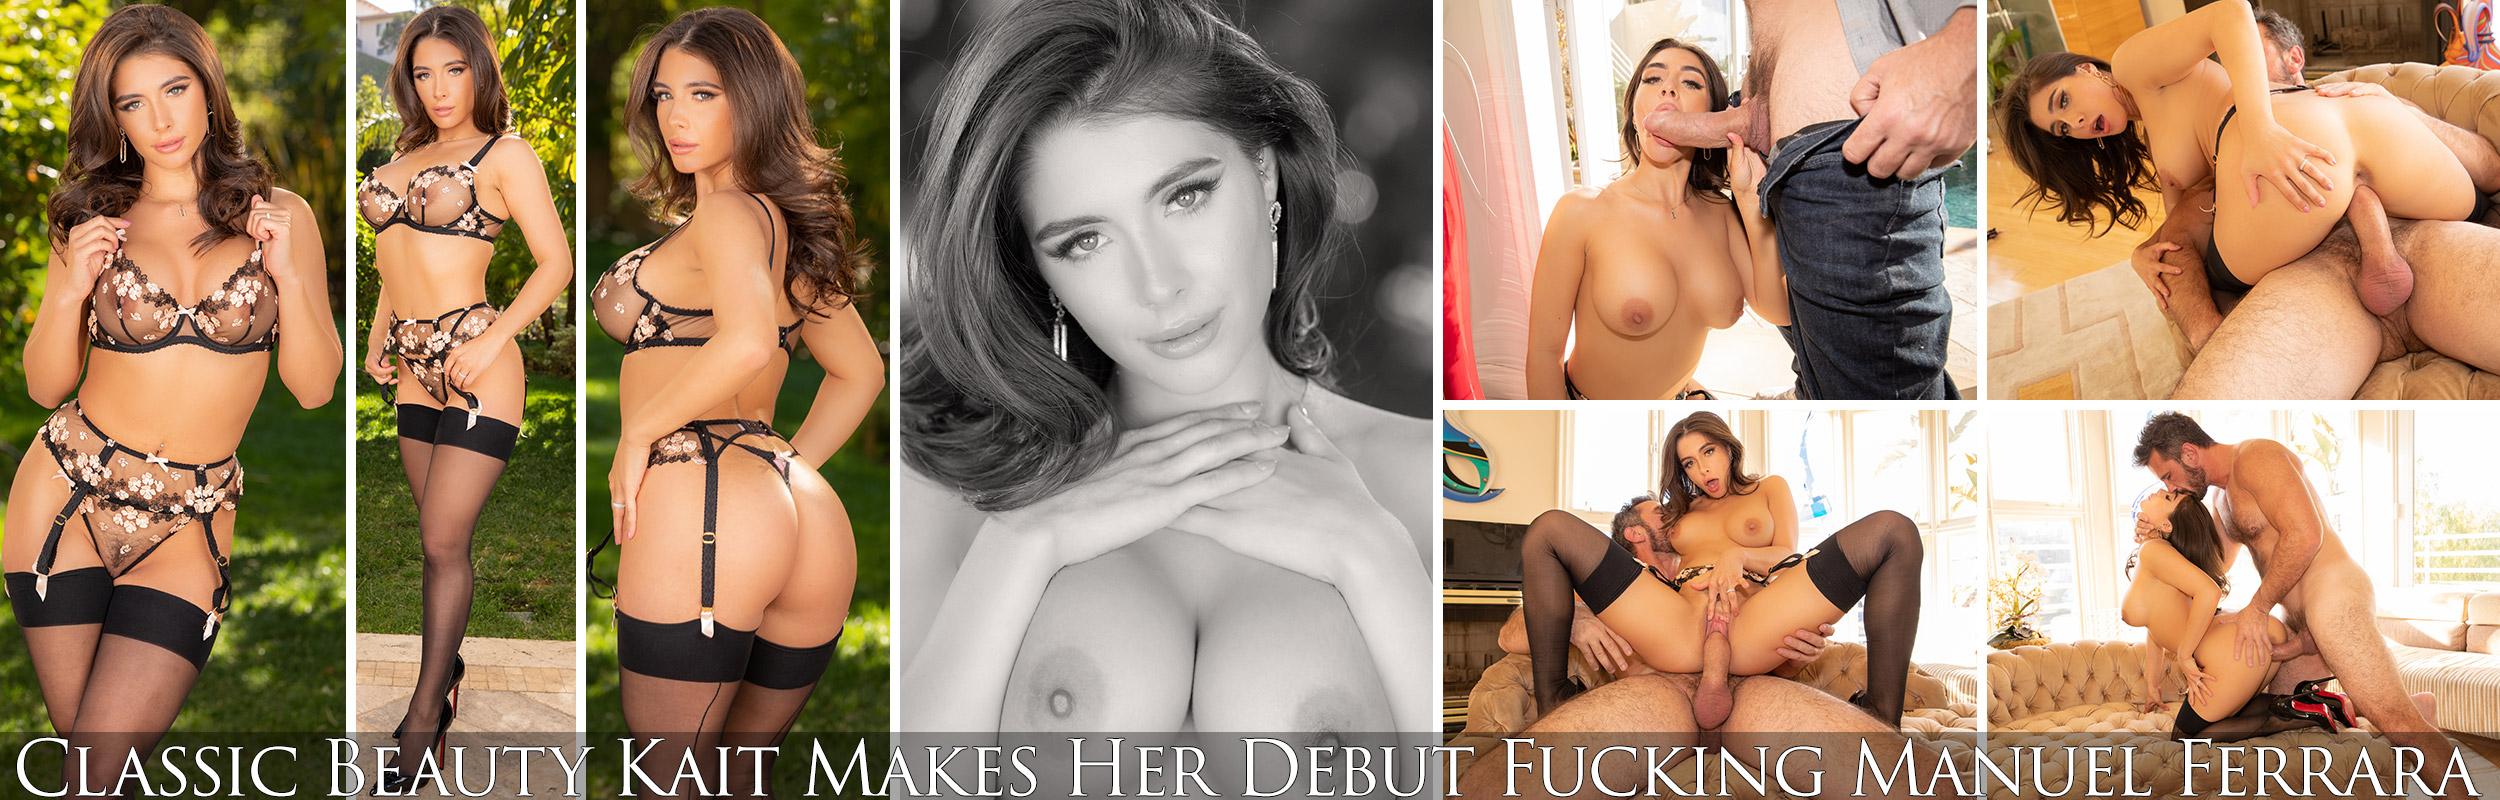 Classic Beauty Kait Makes Her Debut Fucking Manuel Ferrara